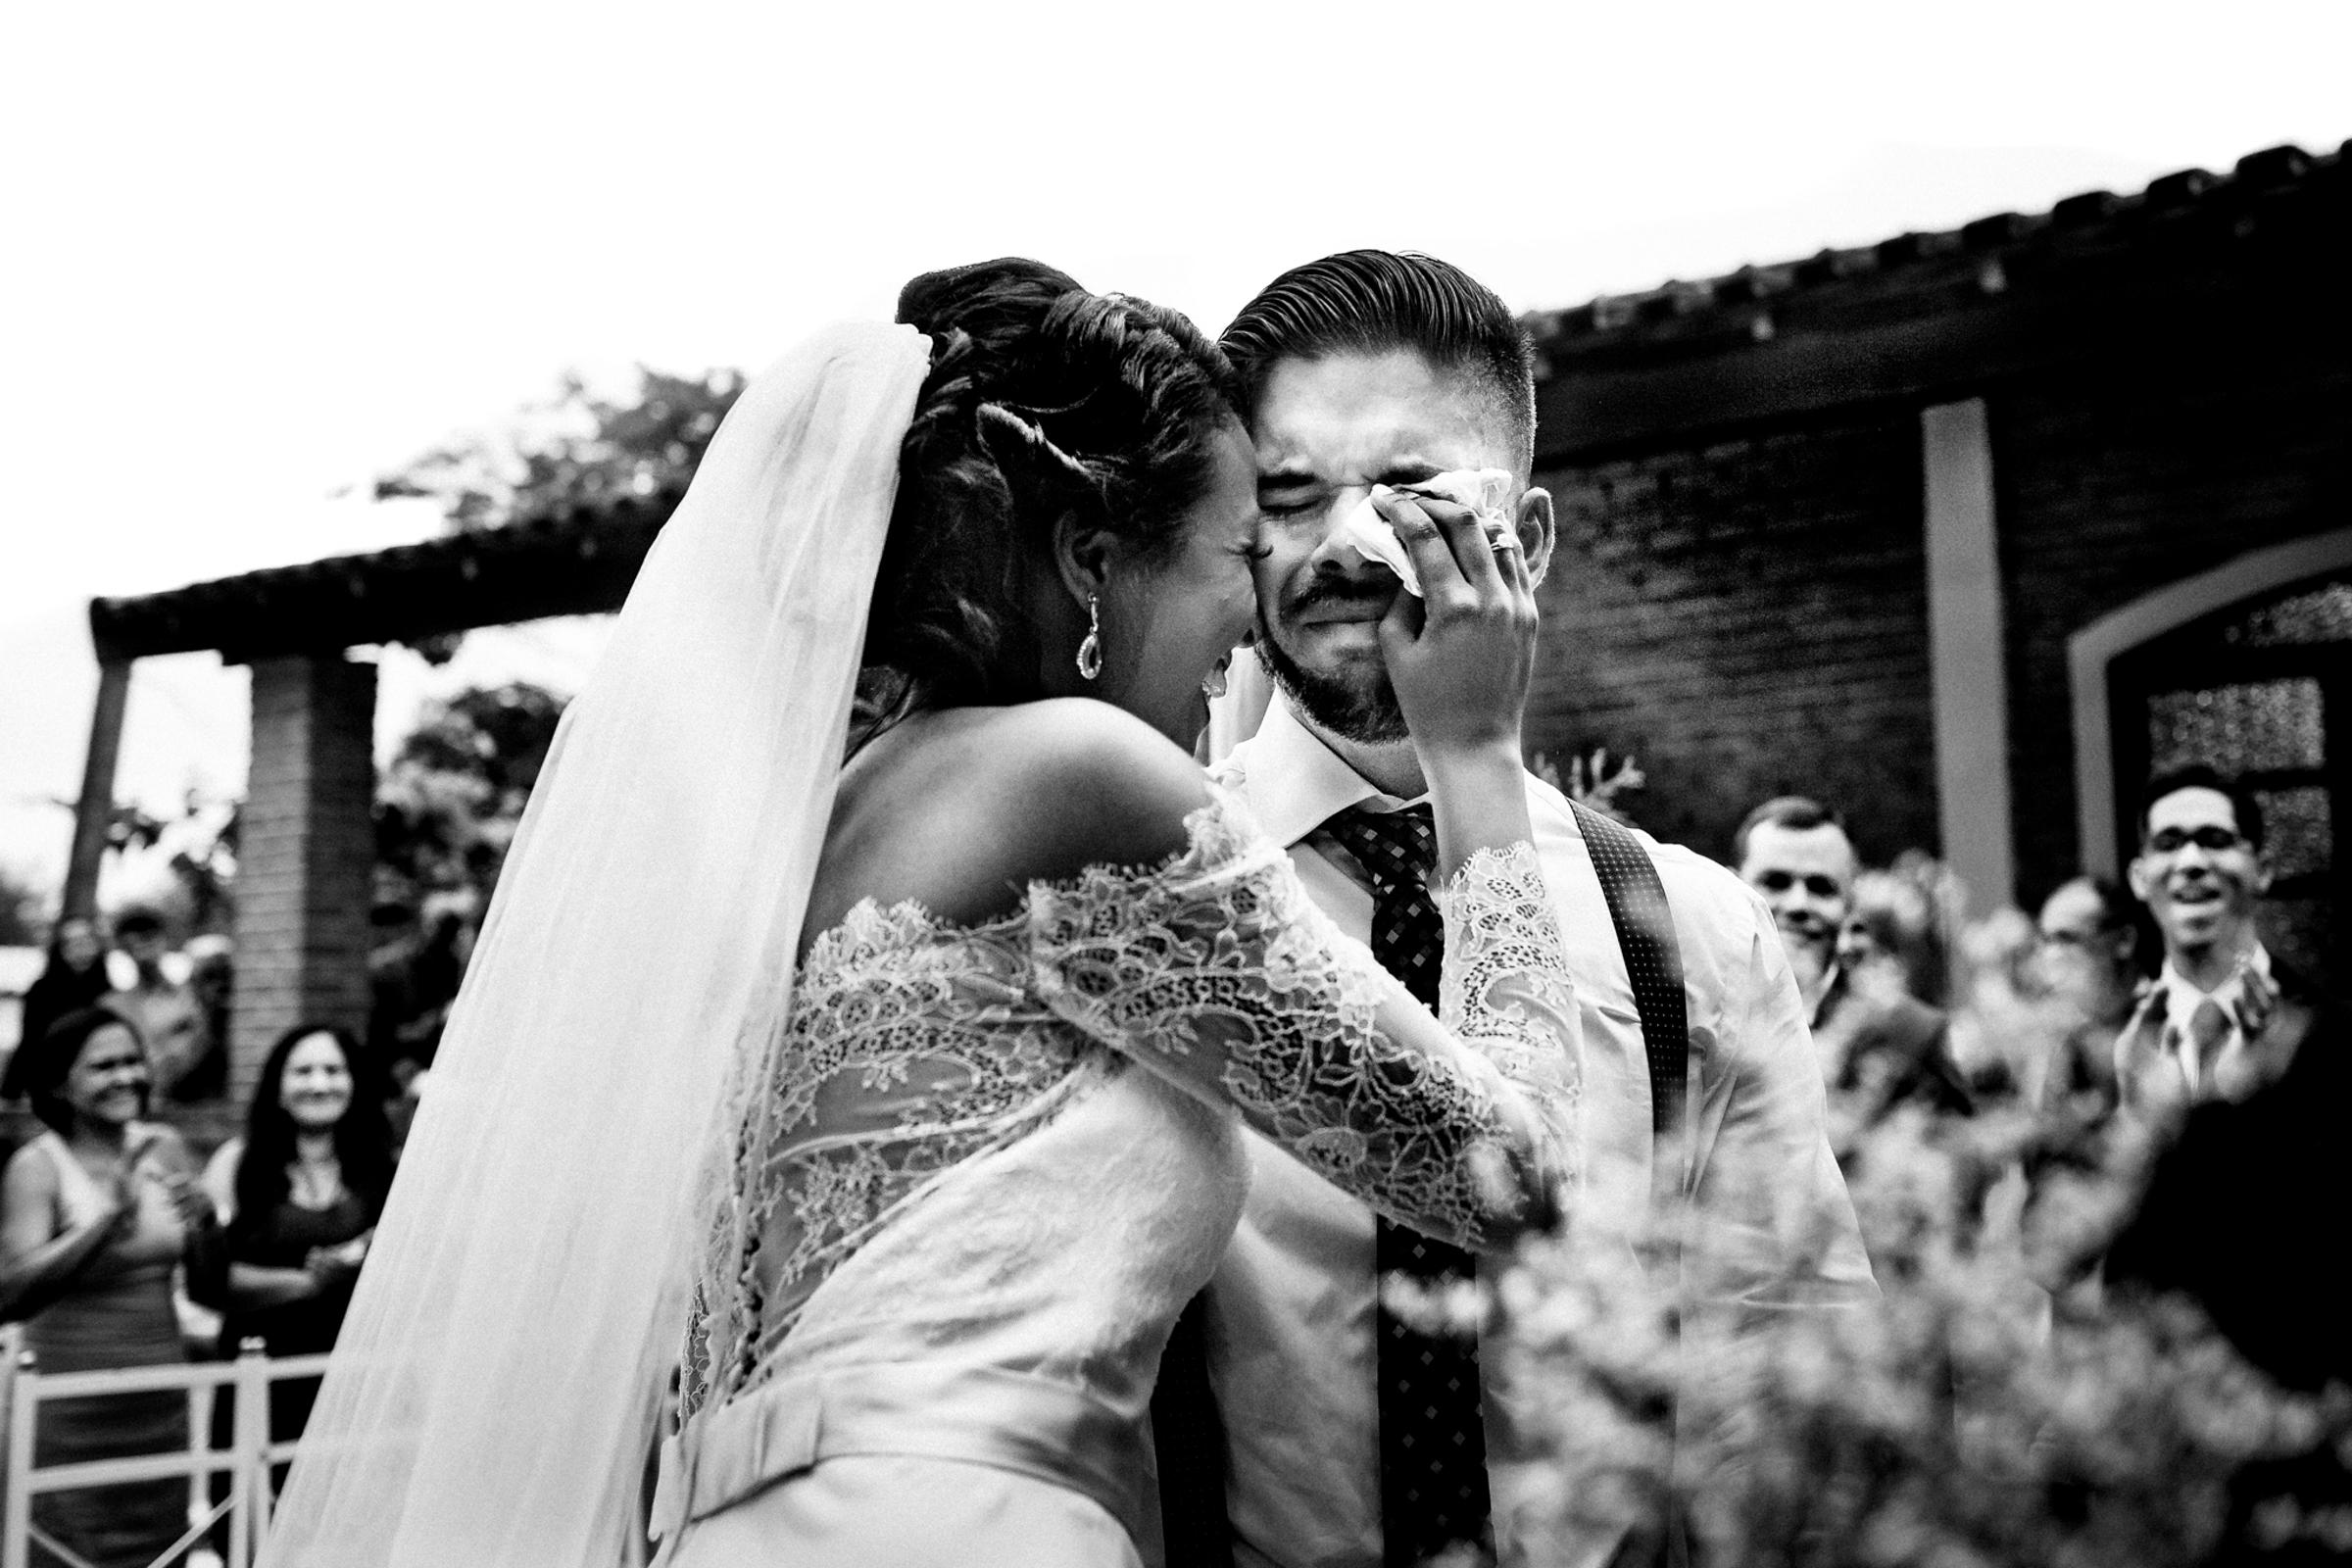 Bride wipes a tear for her groom - photo by Área da Fotografia